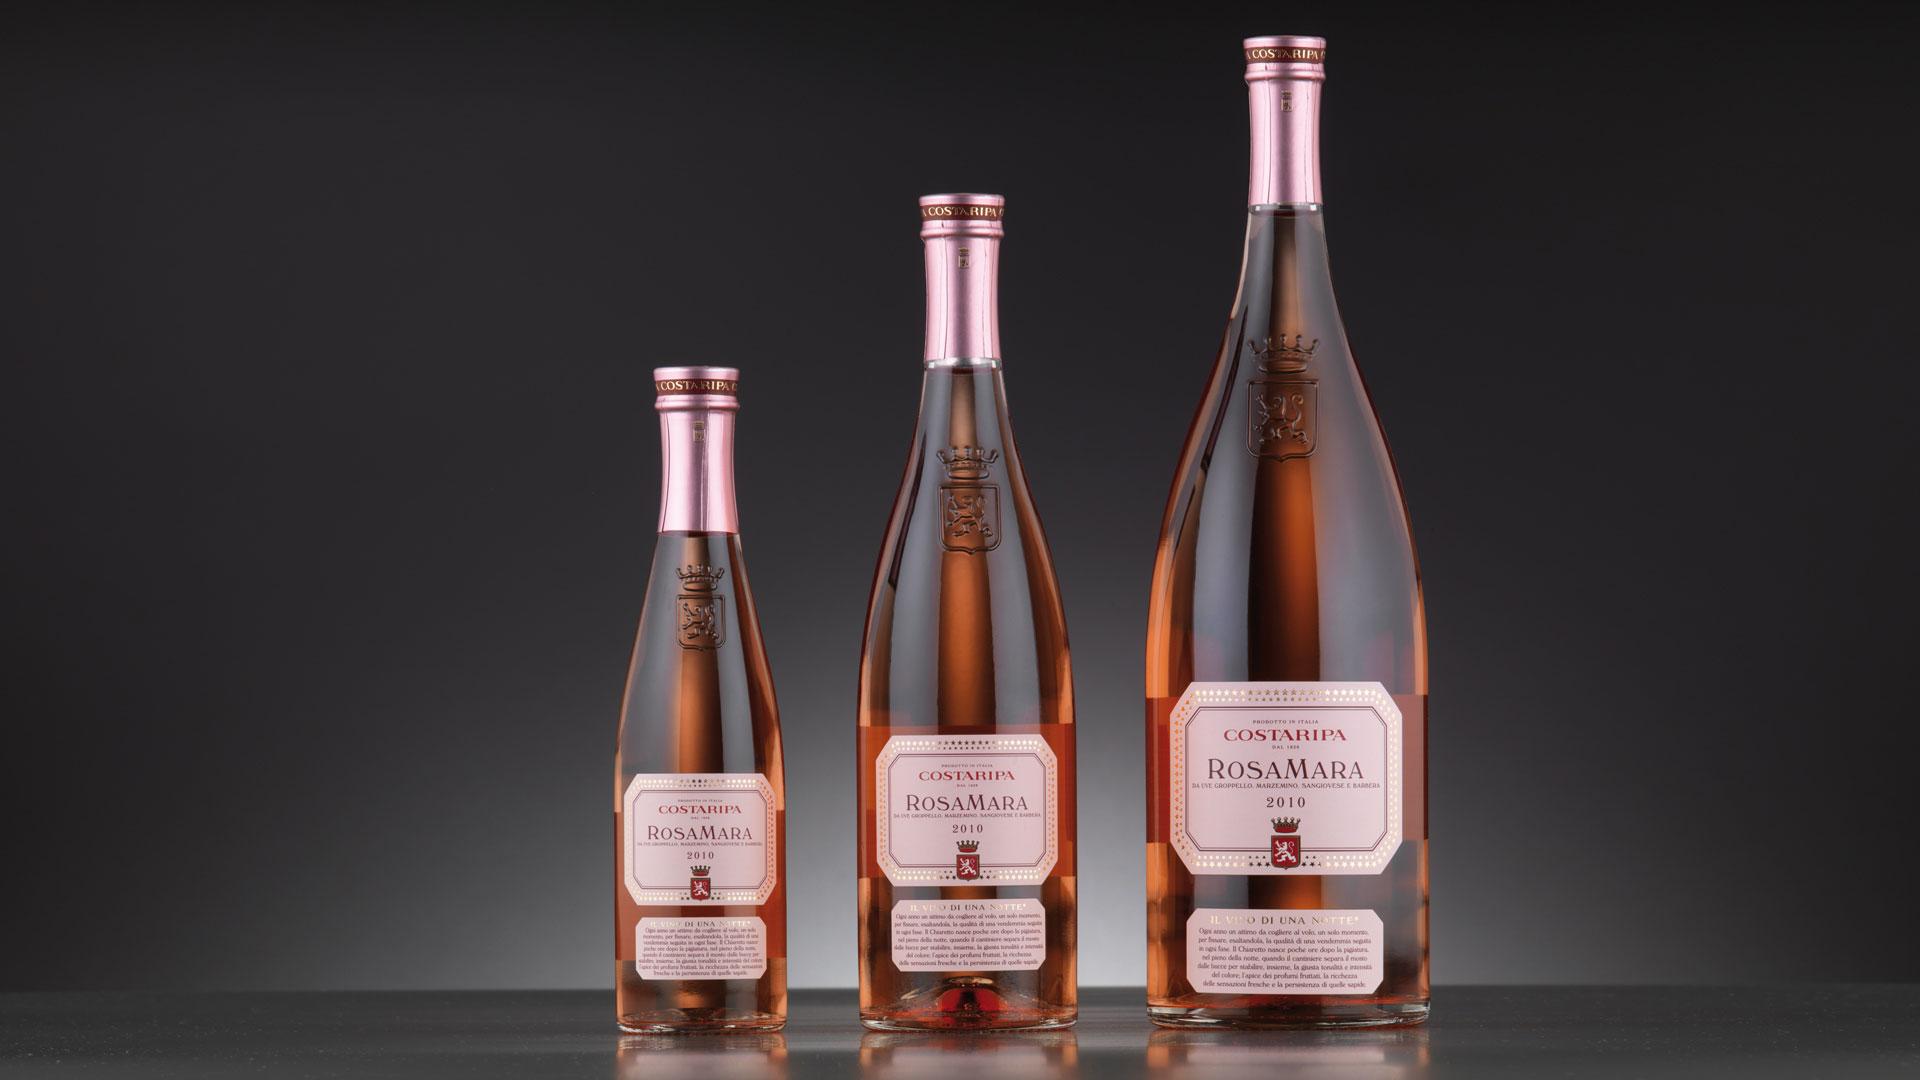 Costaripa Formati bottle design